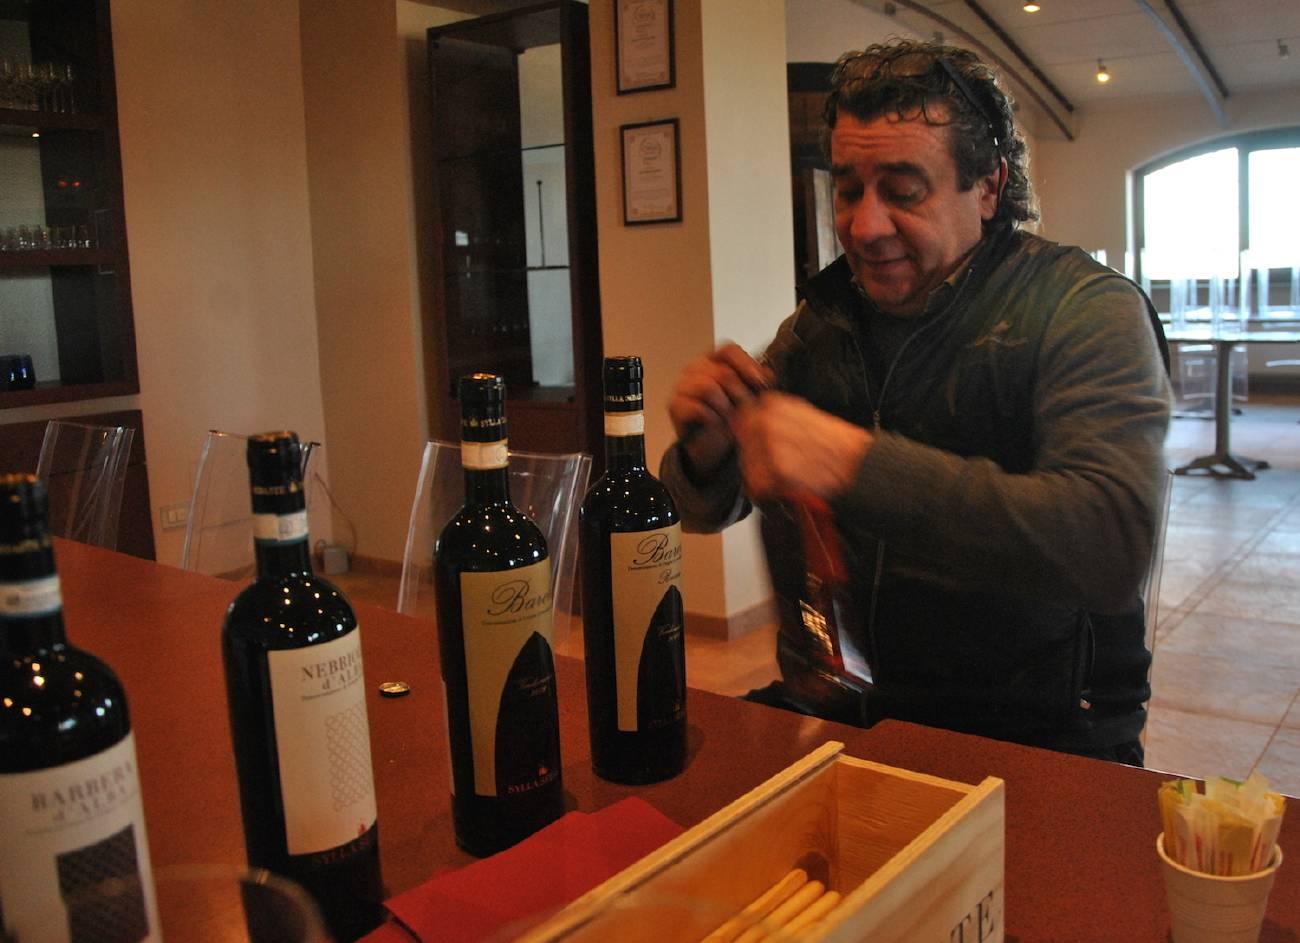 Fabrizio Merlo during the wine tasting